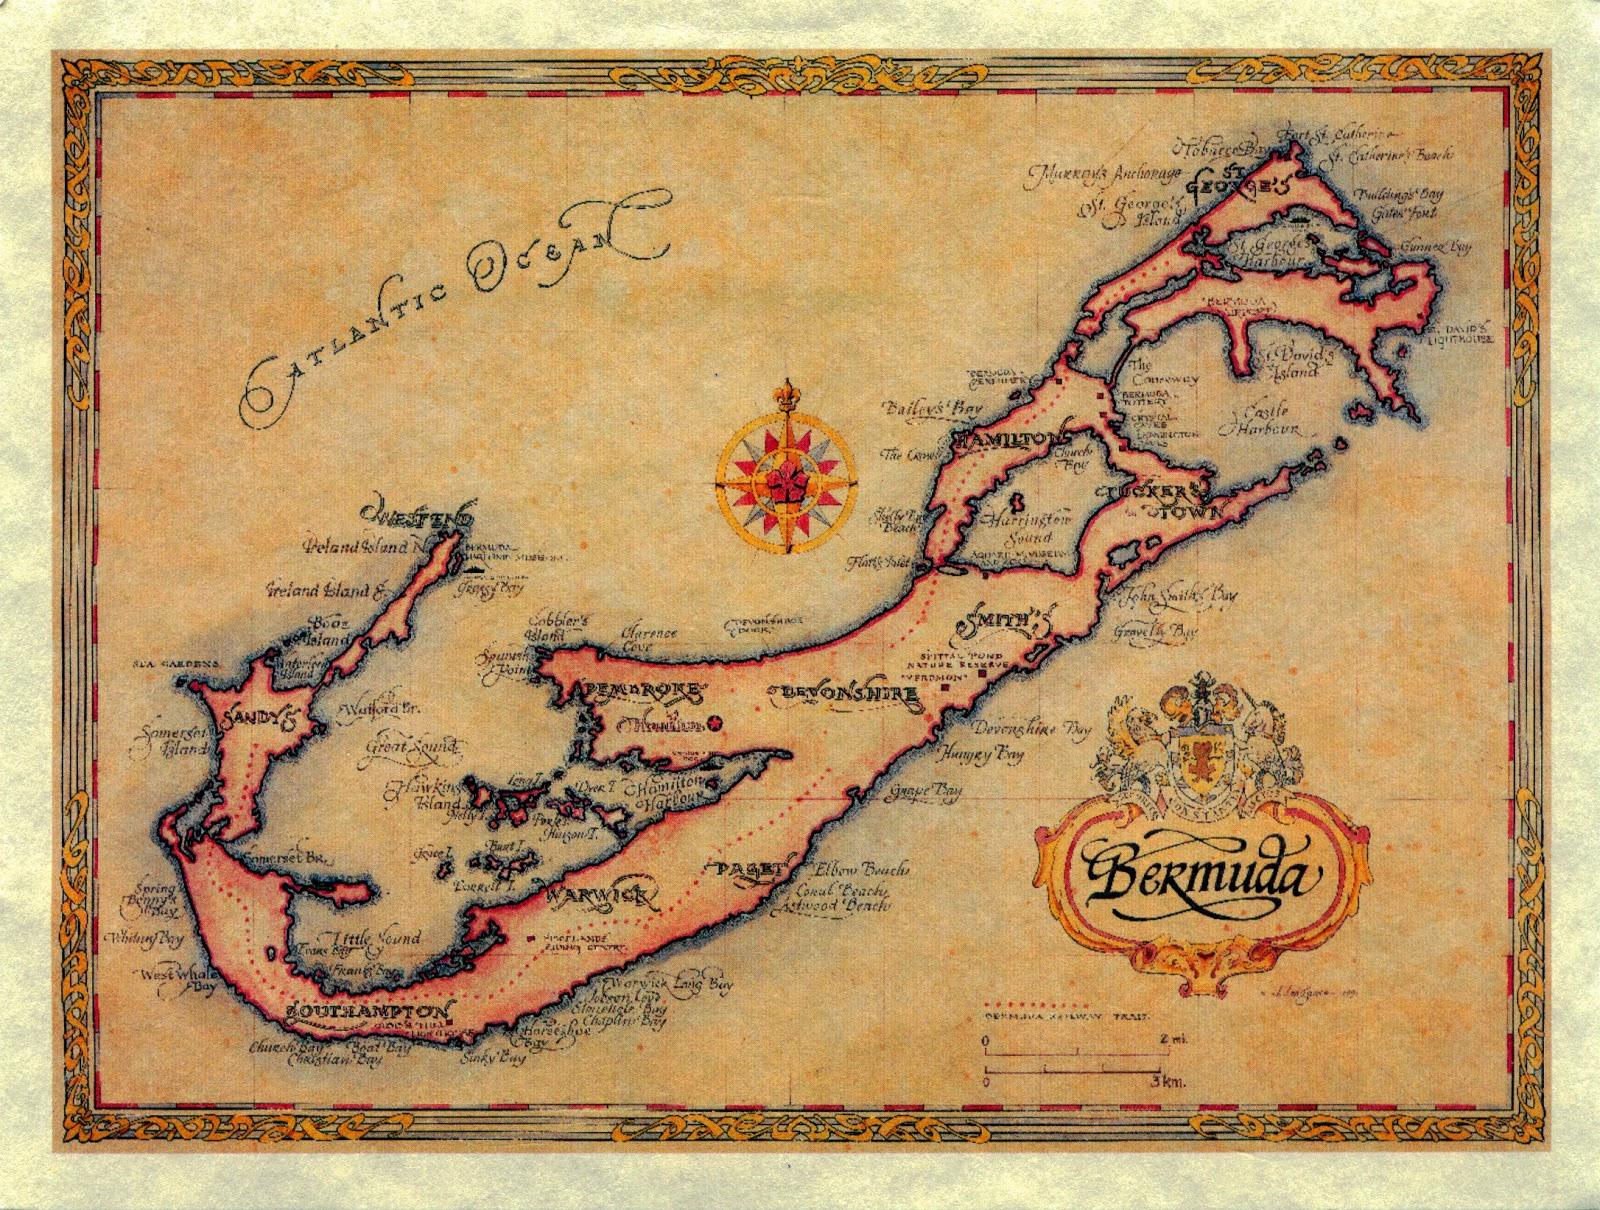 WORLD COME TO MY HOME 10811082 22872288 UNITED KINGDOM – Bermuda Tourist Map